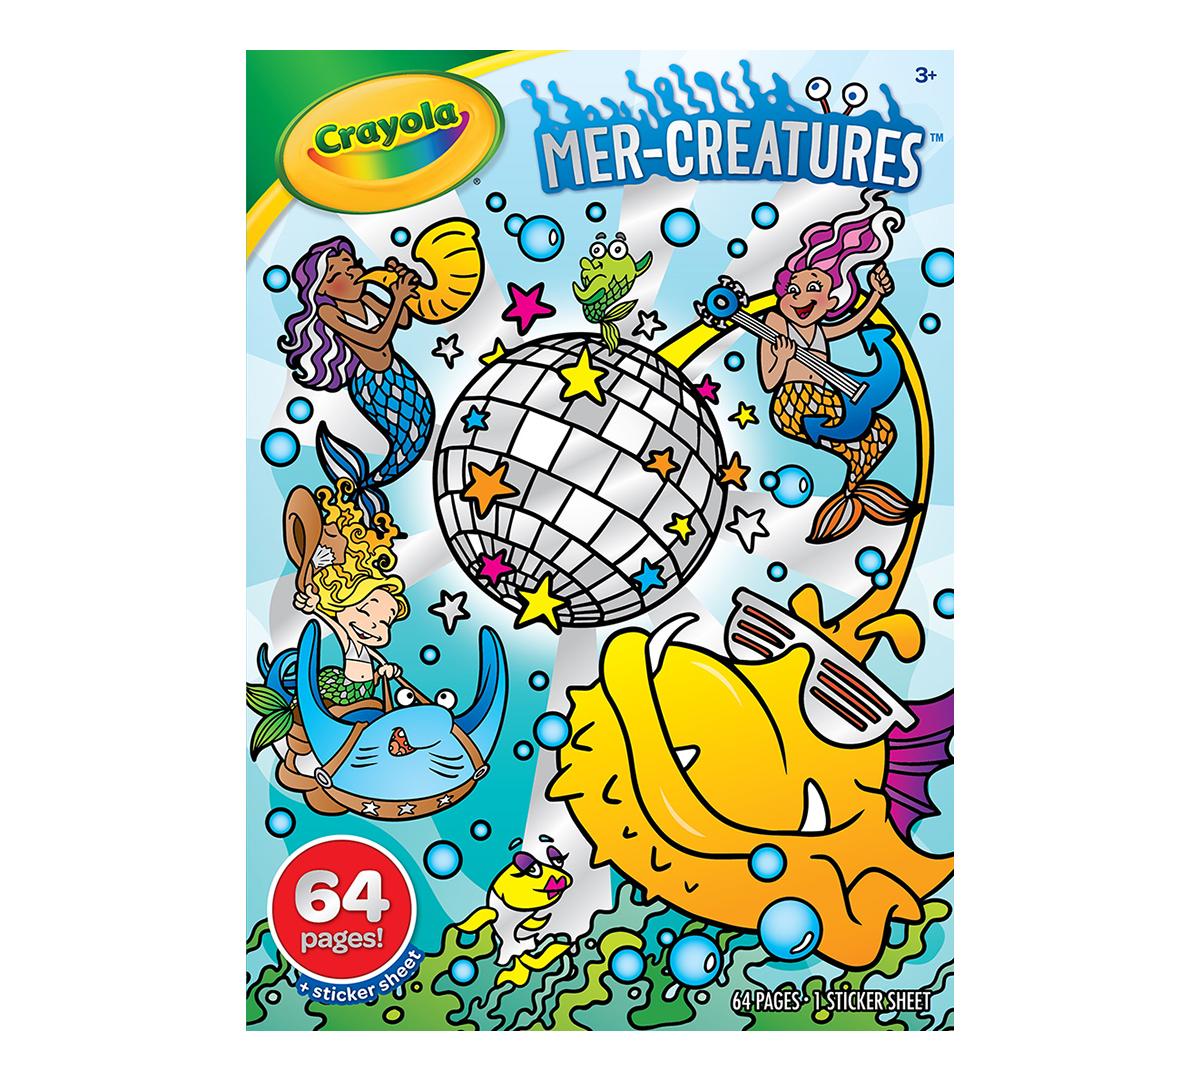 Mer-Creatures Coloring Book